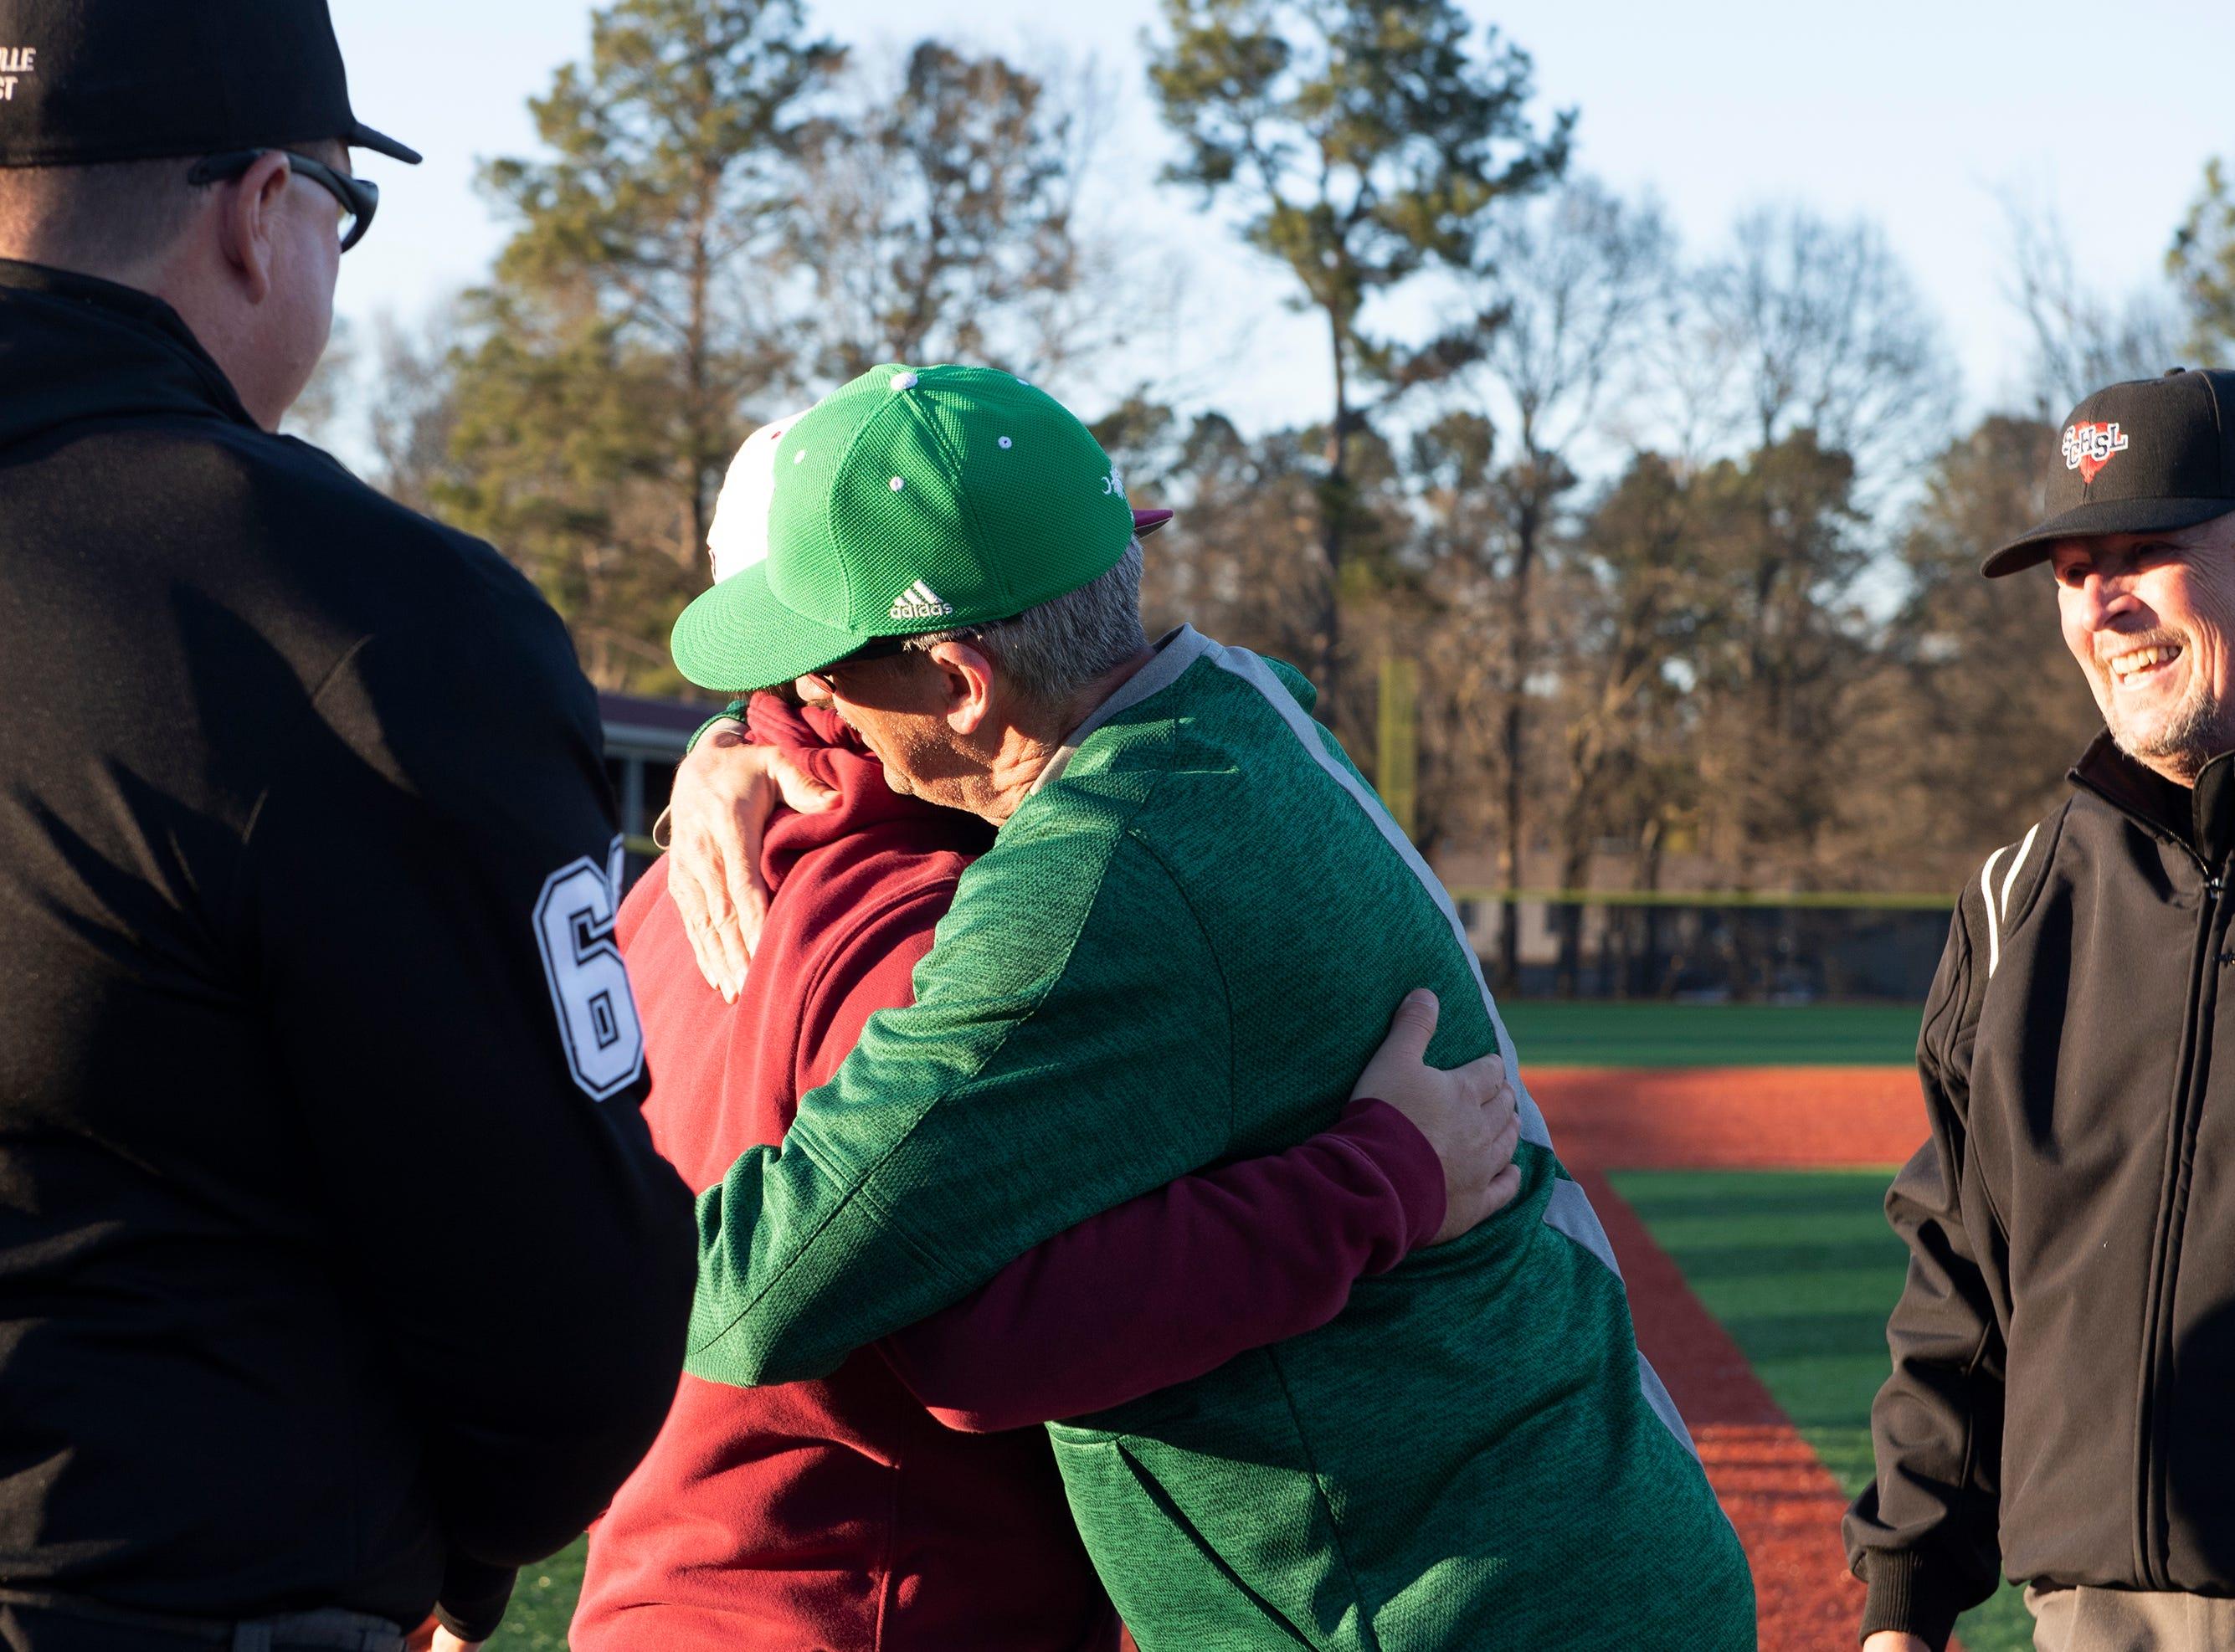 Westside High School head coach Jarrod Payne and Easley High School head coach Gill Payne hug before the start of their game at Westside High School Tuesday, Mar. 5, 2019.